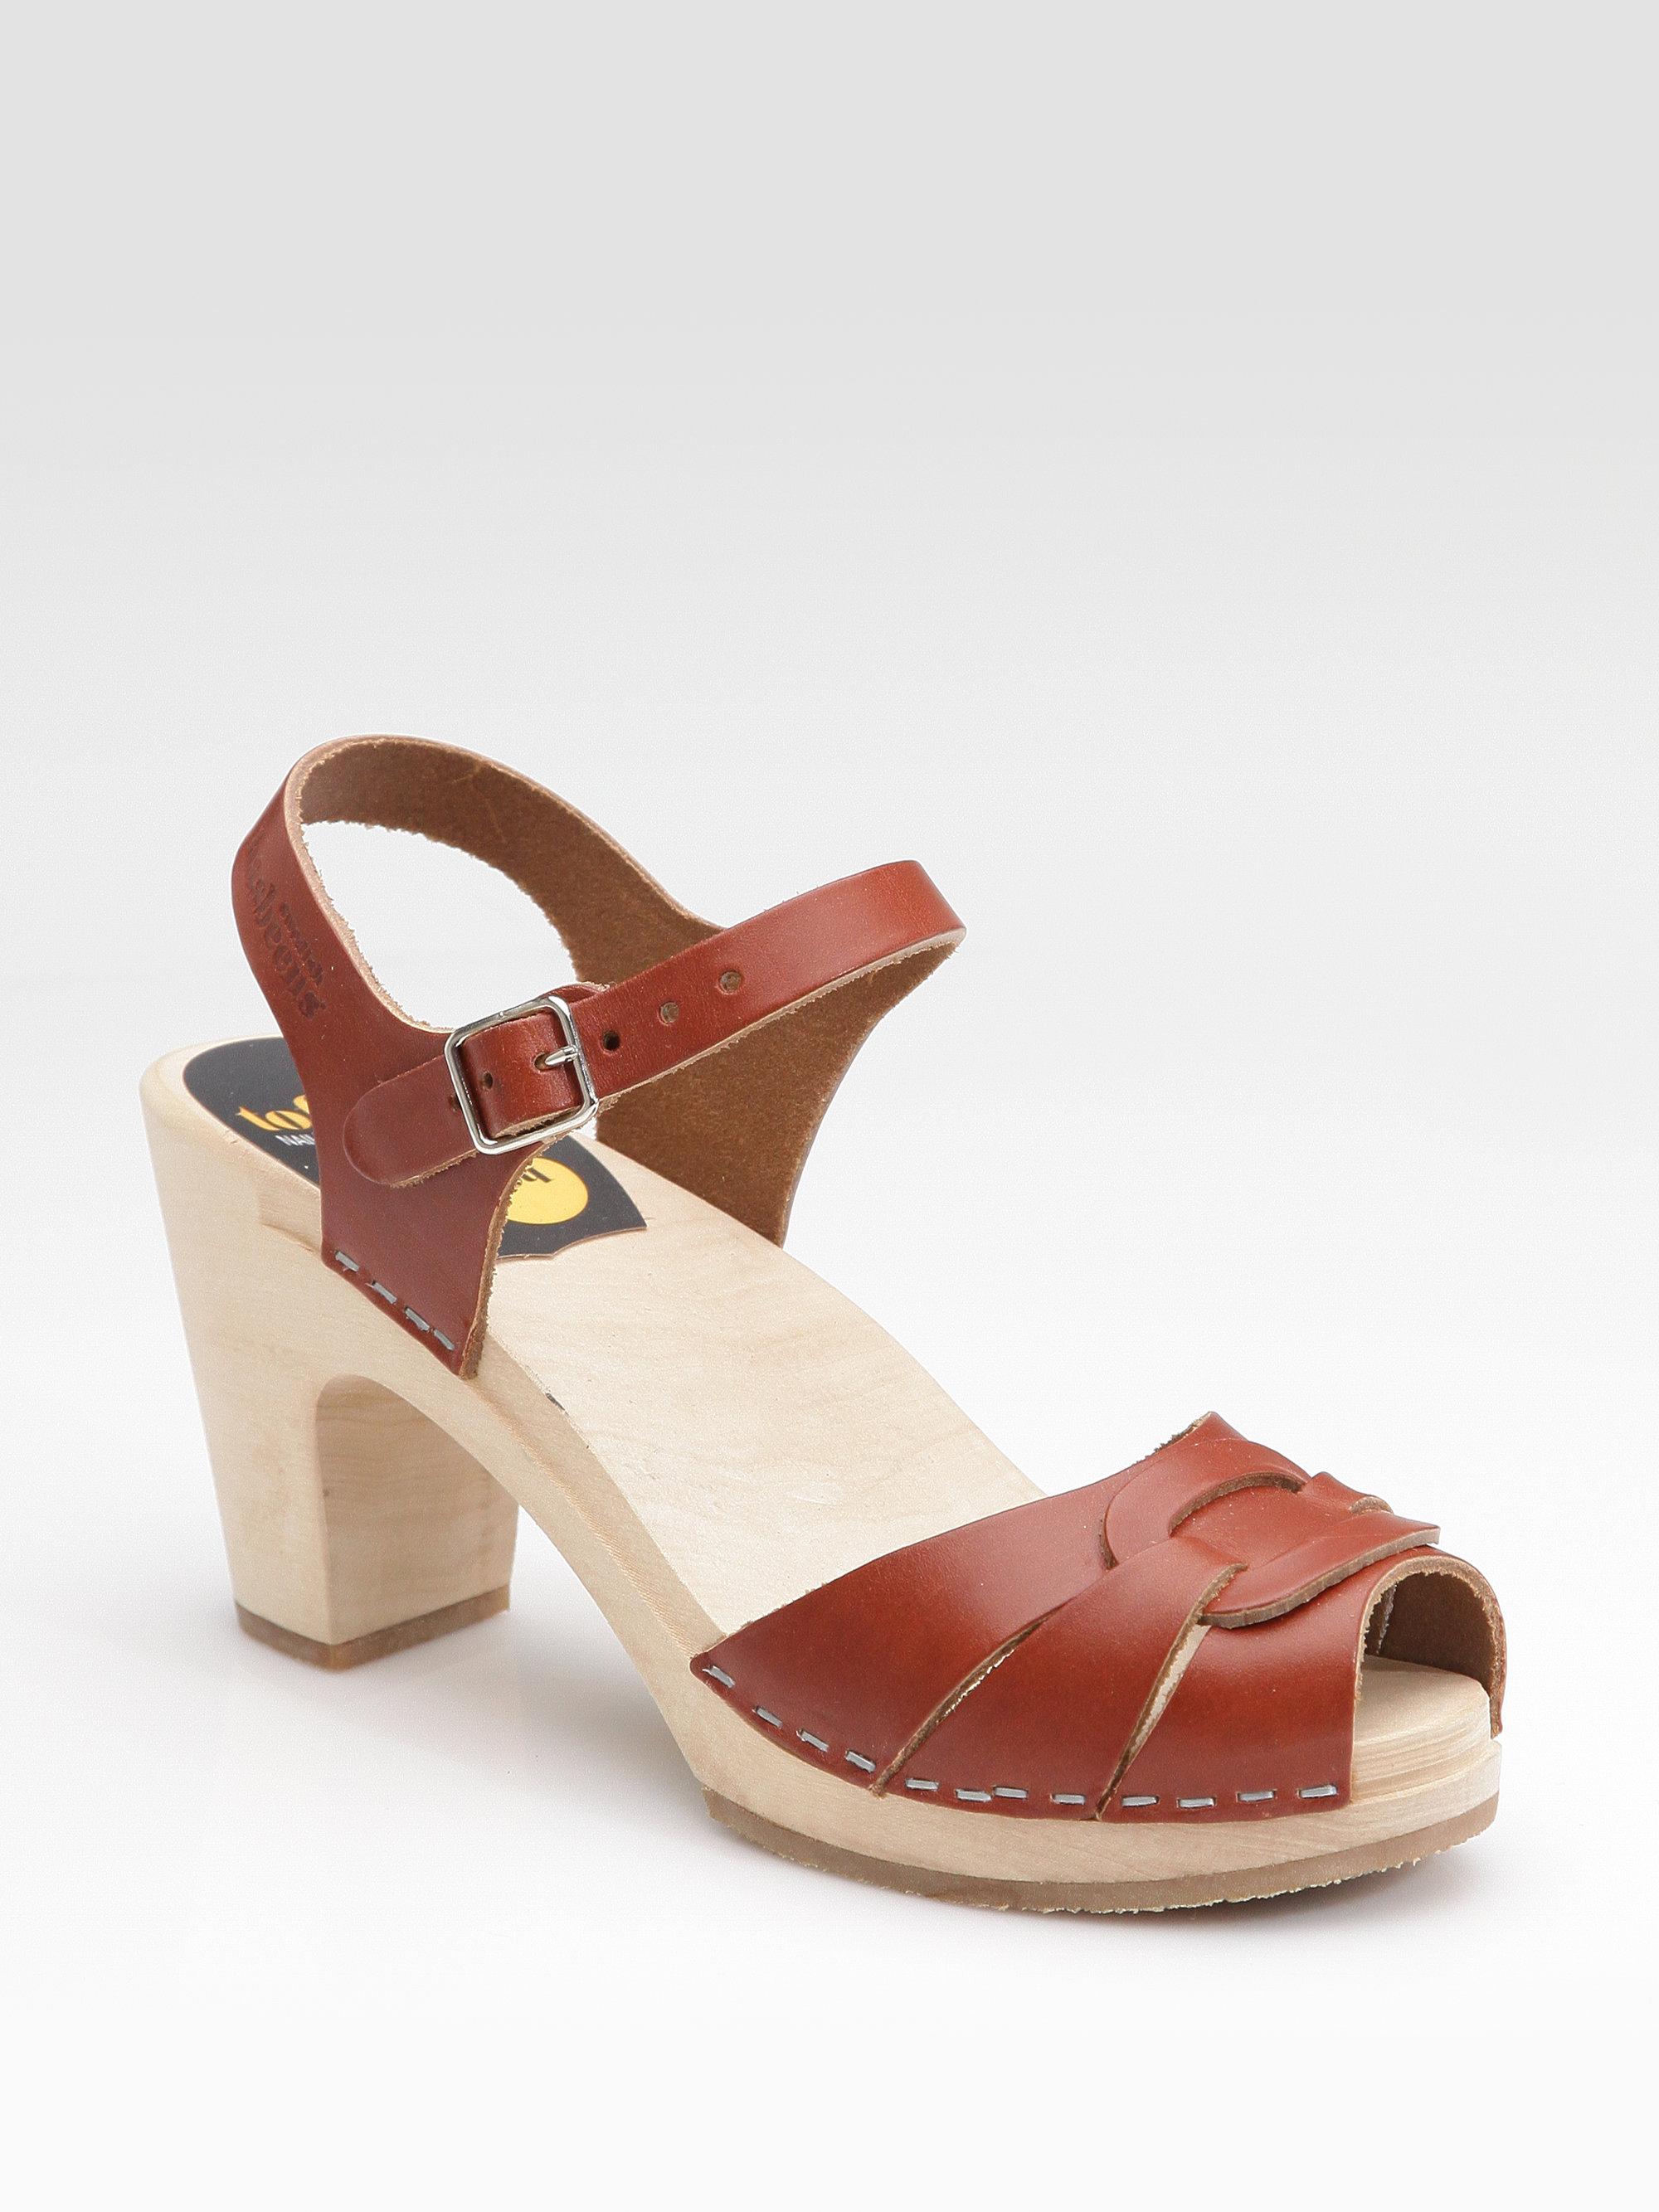 Lyst Swedish Hasbeens Peep Toe Sandals In Brown